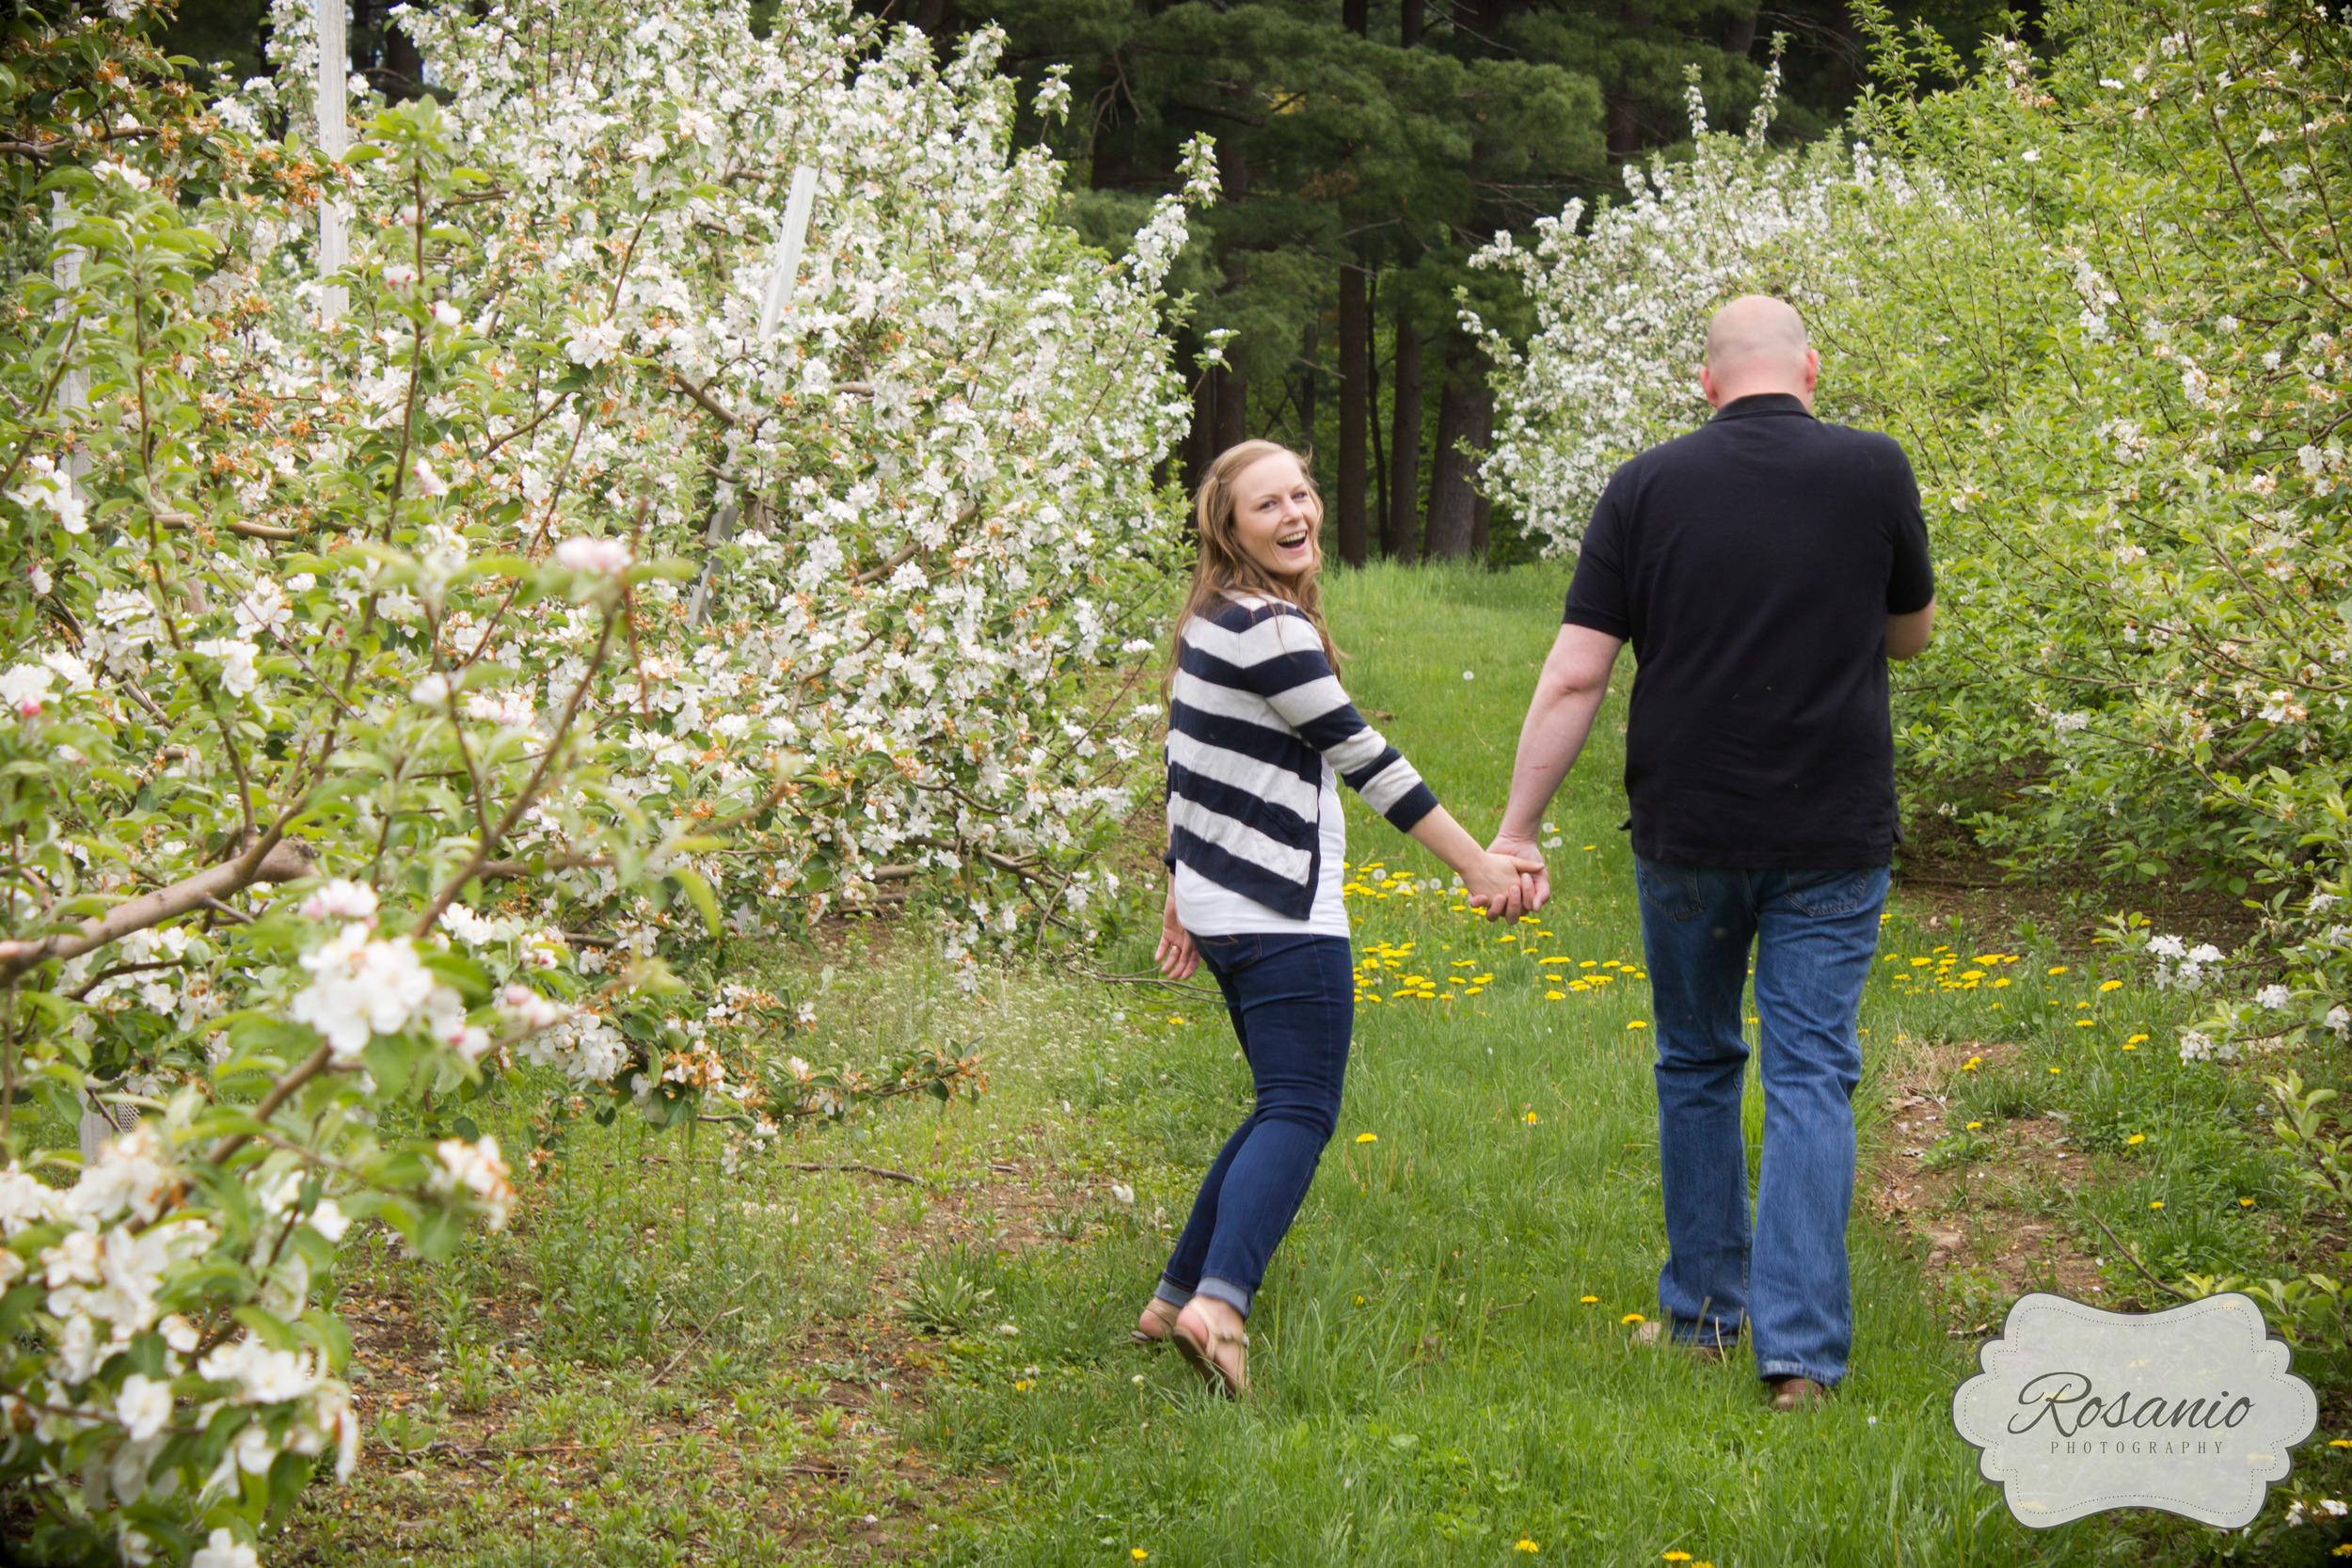 Rosanio Photography | Smolak Farms Engagement Photography | Massachusetts Engagement Photos